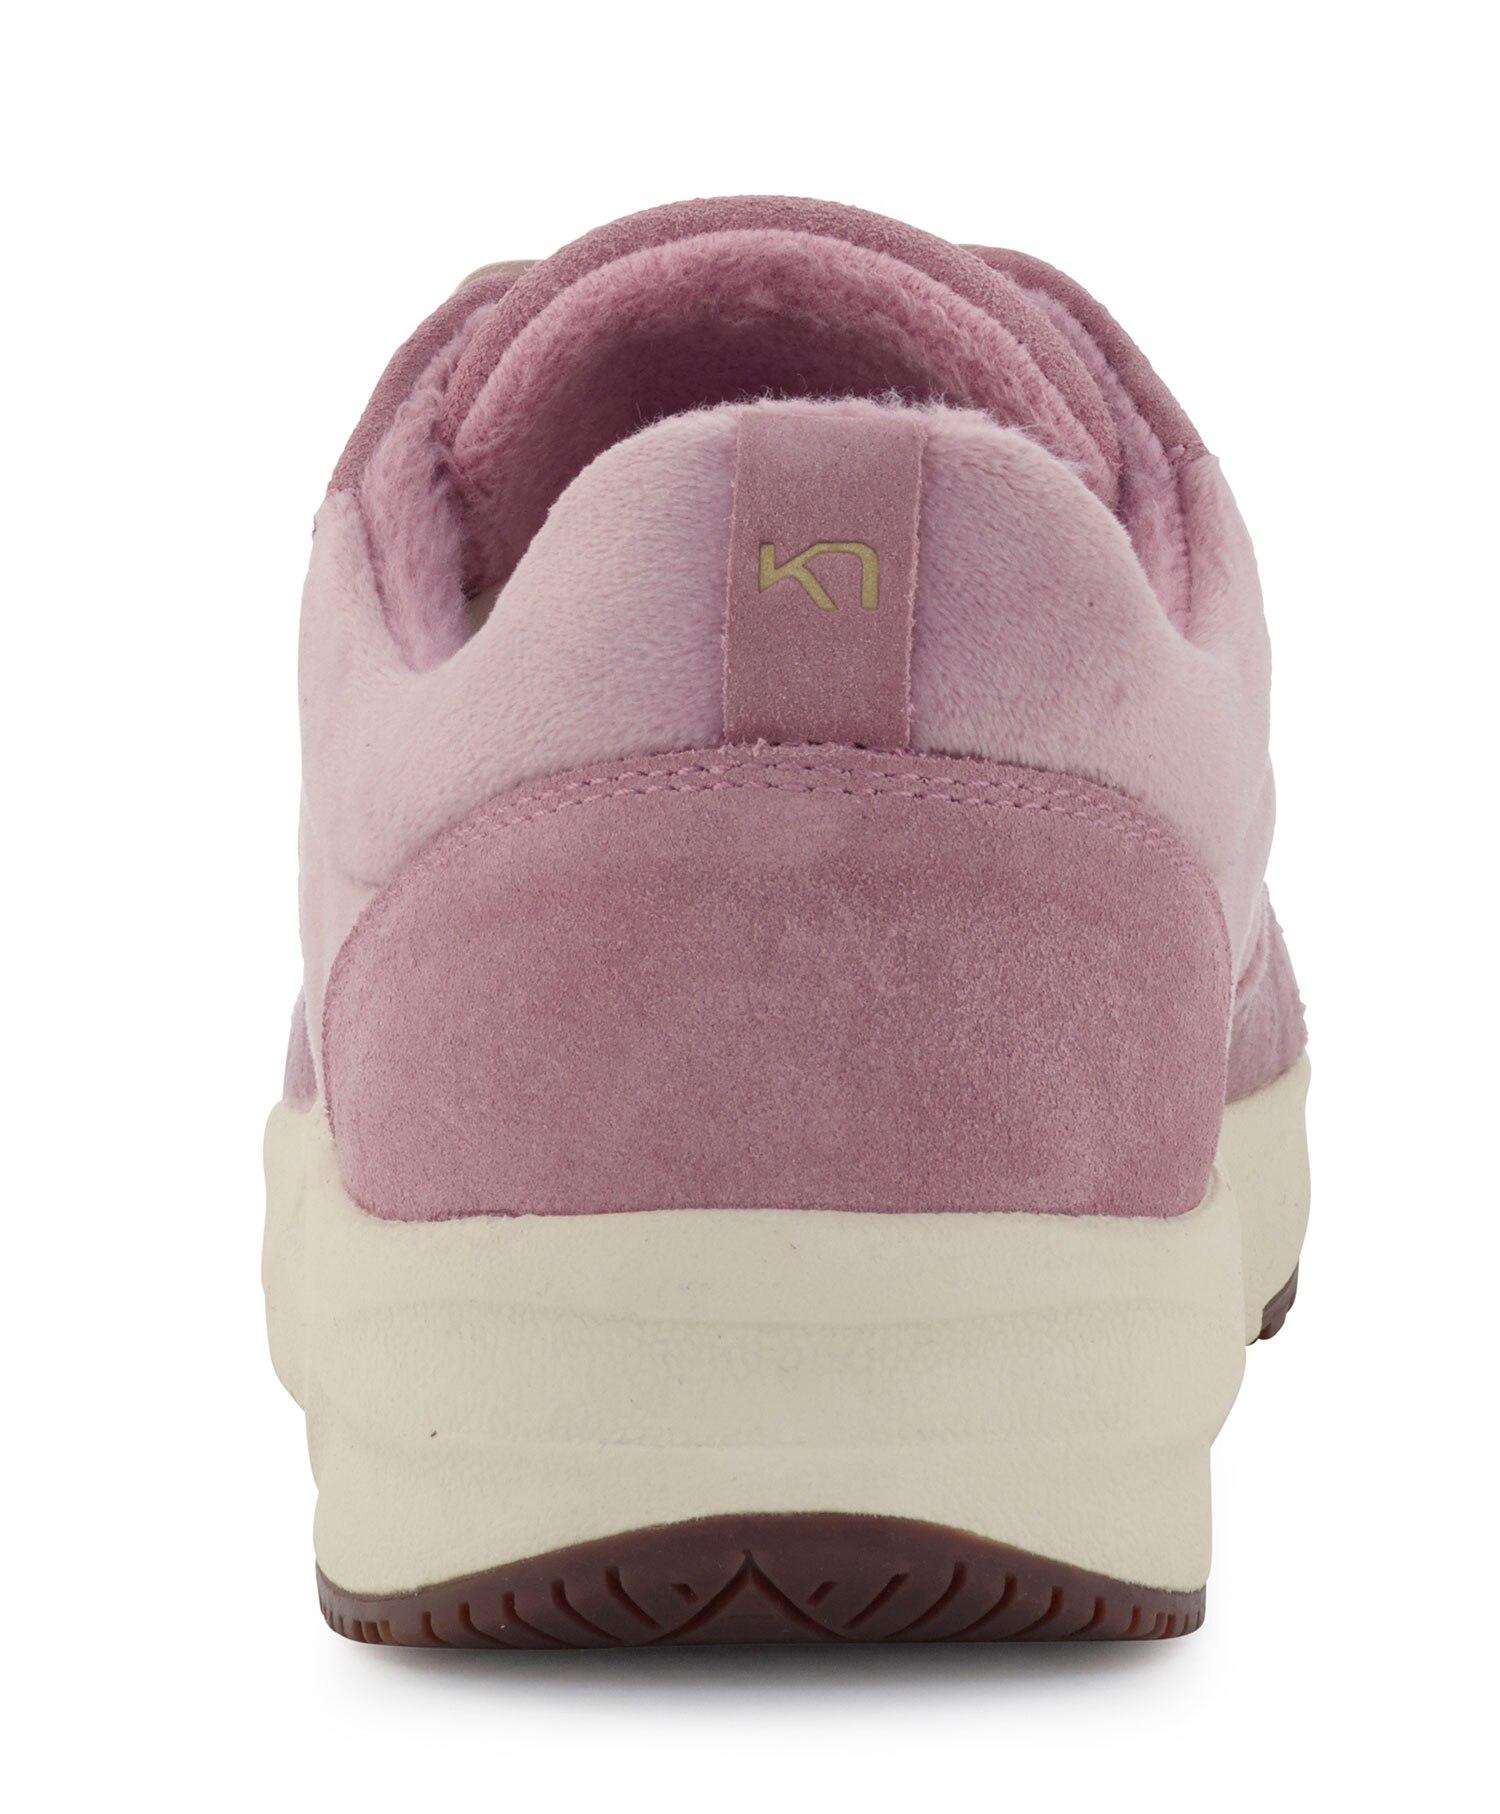 Kari Traa Trinn Sneakers